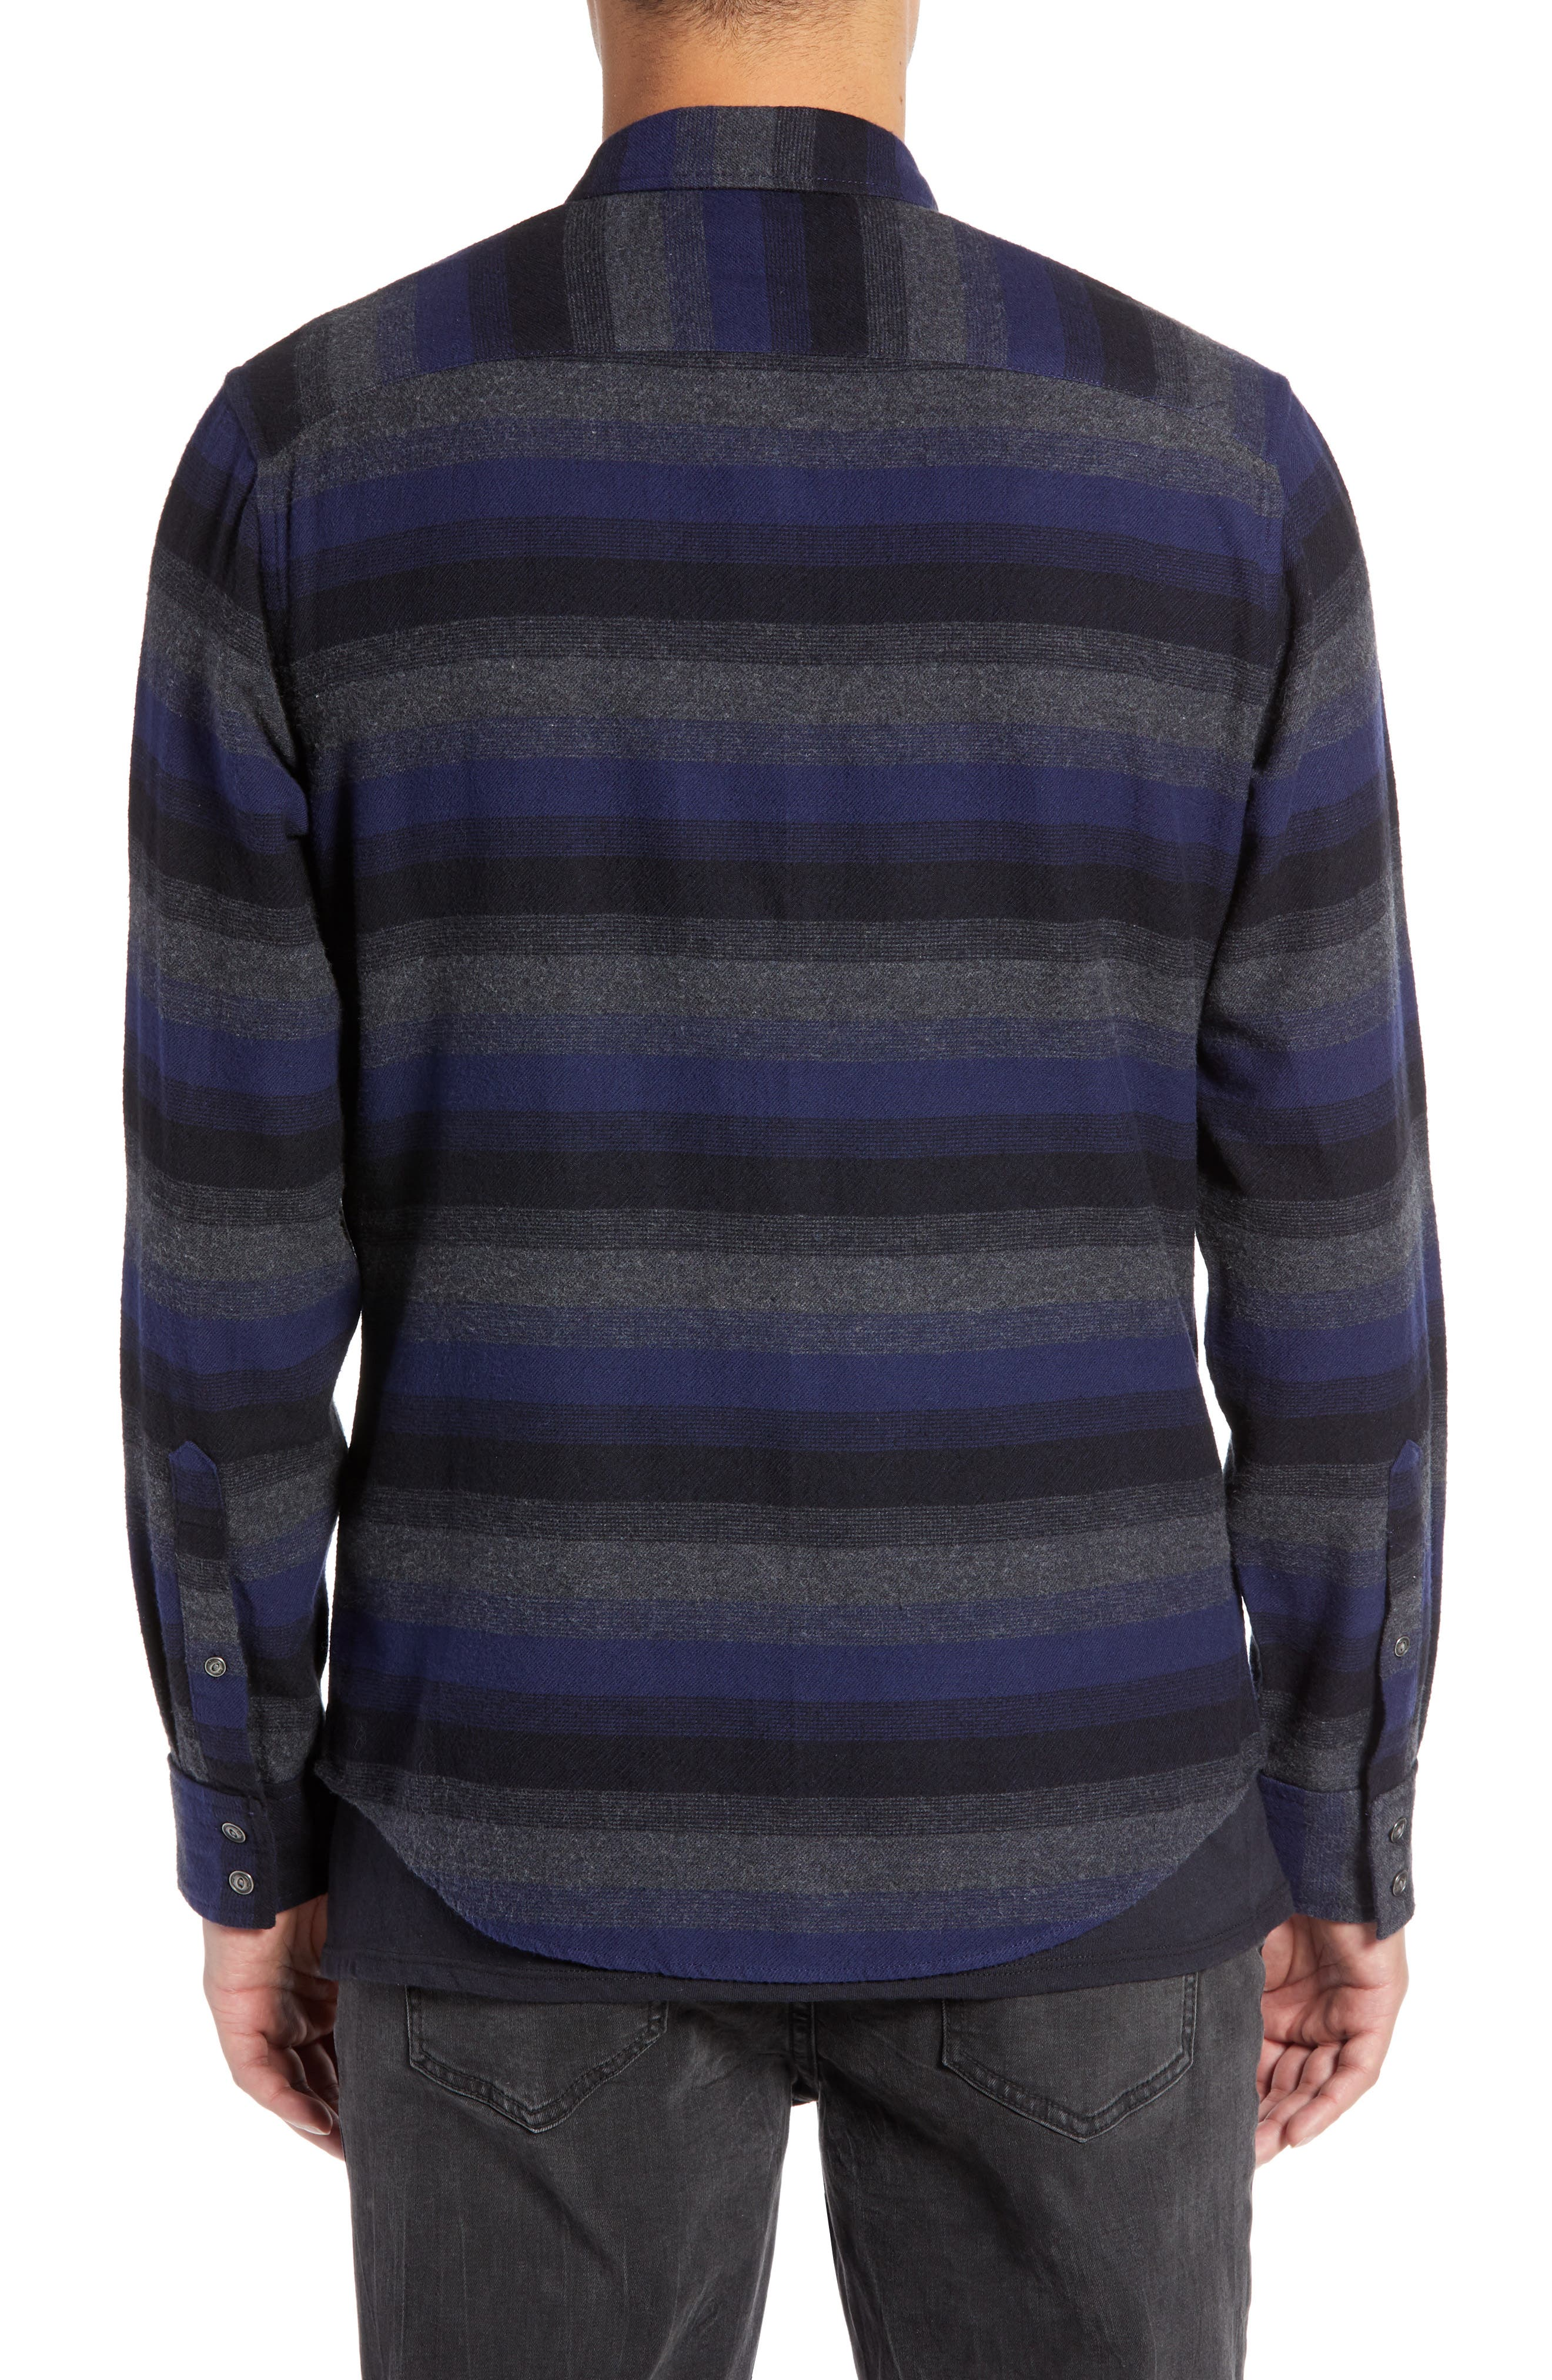 Regular Fit Ombré Sport Shirt,                             Alternate thumbnail 3, color,                             NAVY CHARCOAL OMBRE STRIPE